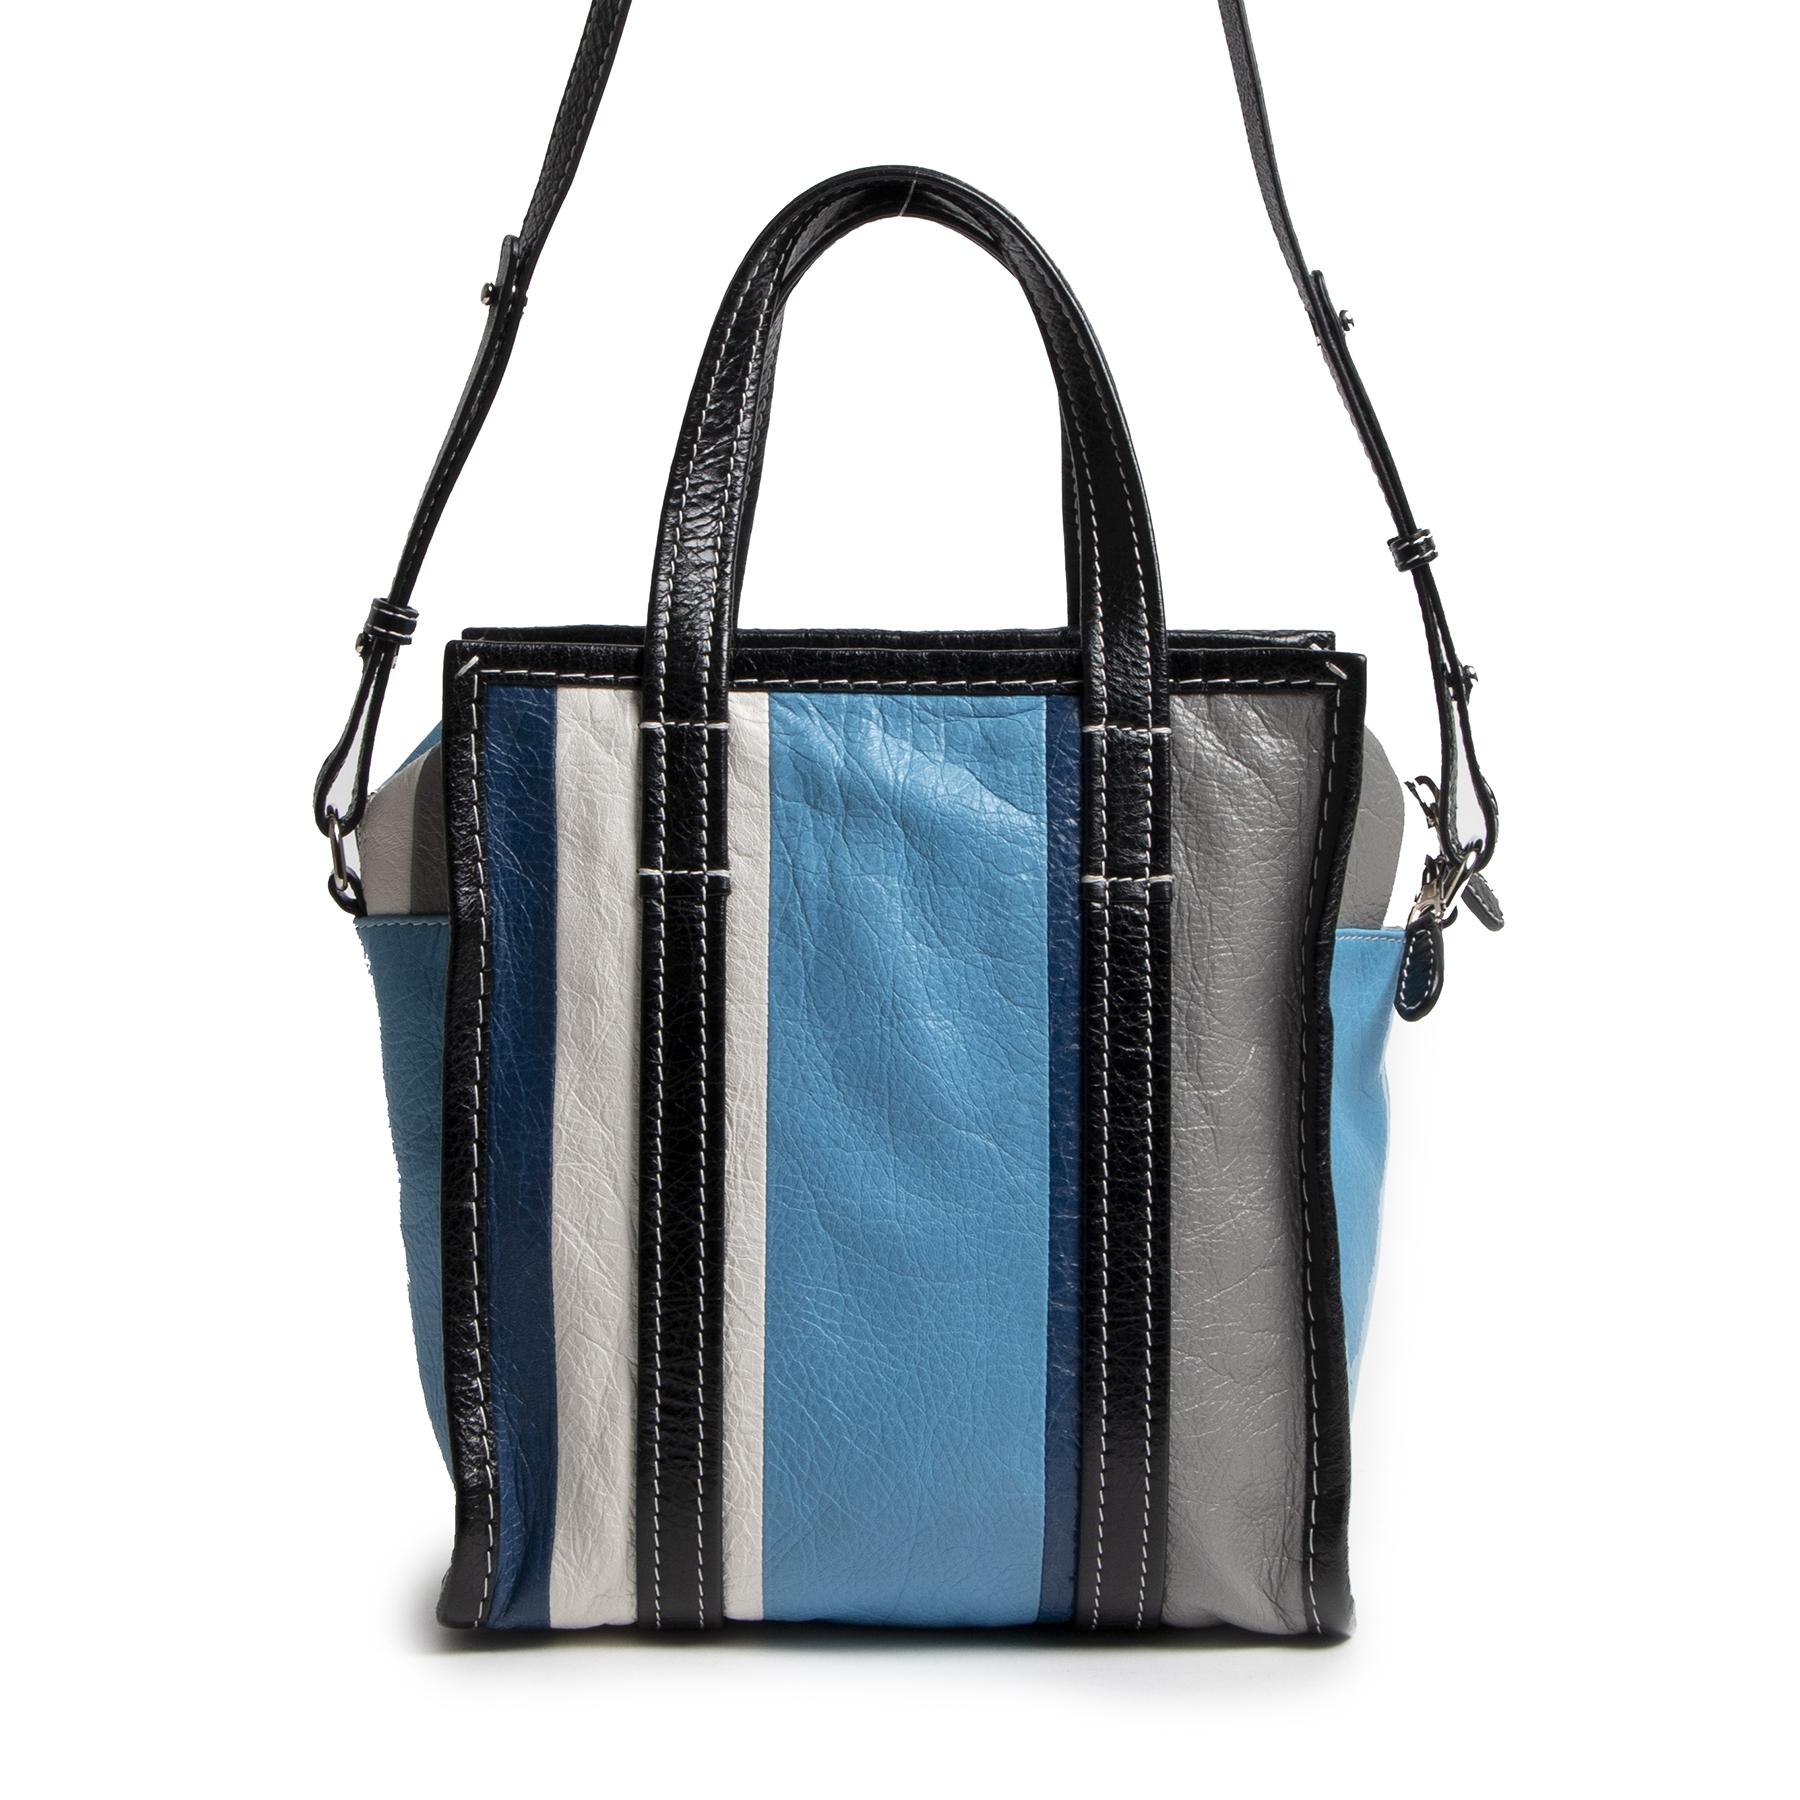 Authentic secondhand Balenciaga Blue Stripe Bazar Shopper Mini Tote Bag designer bags fashion luxury vintage webshop safe secure online shopping